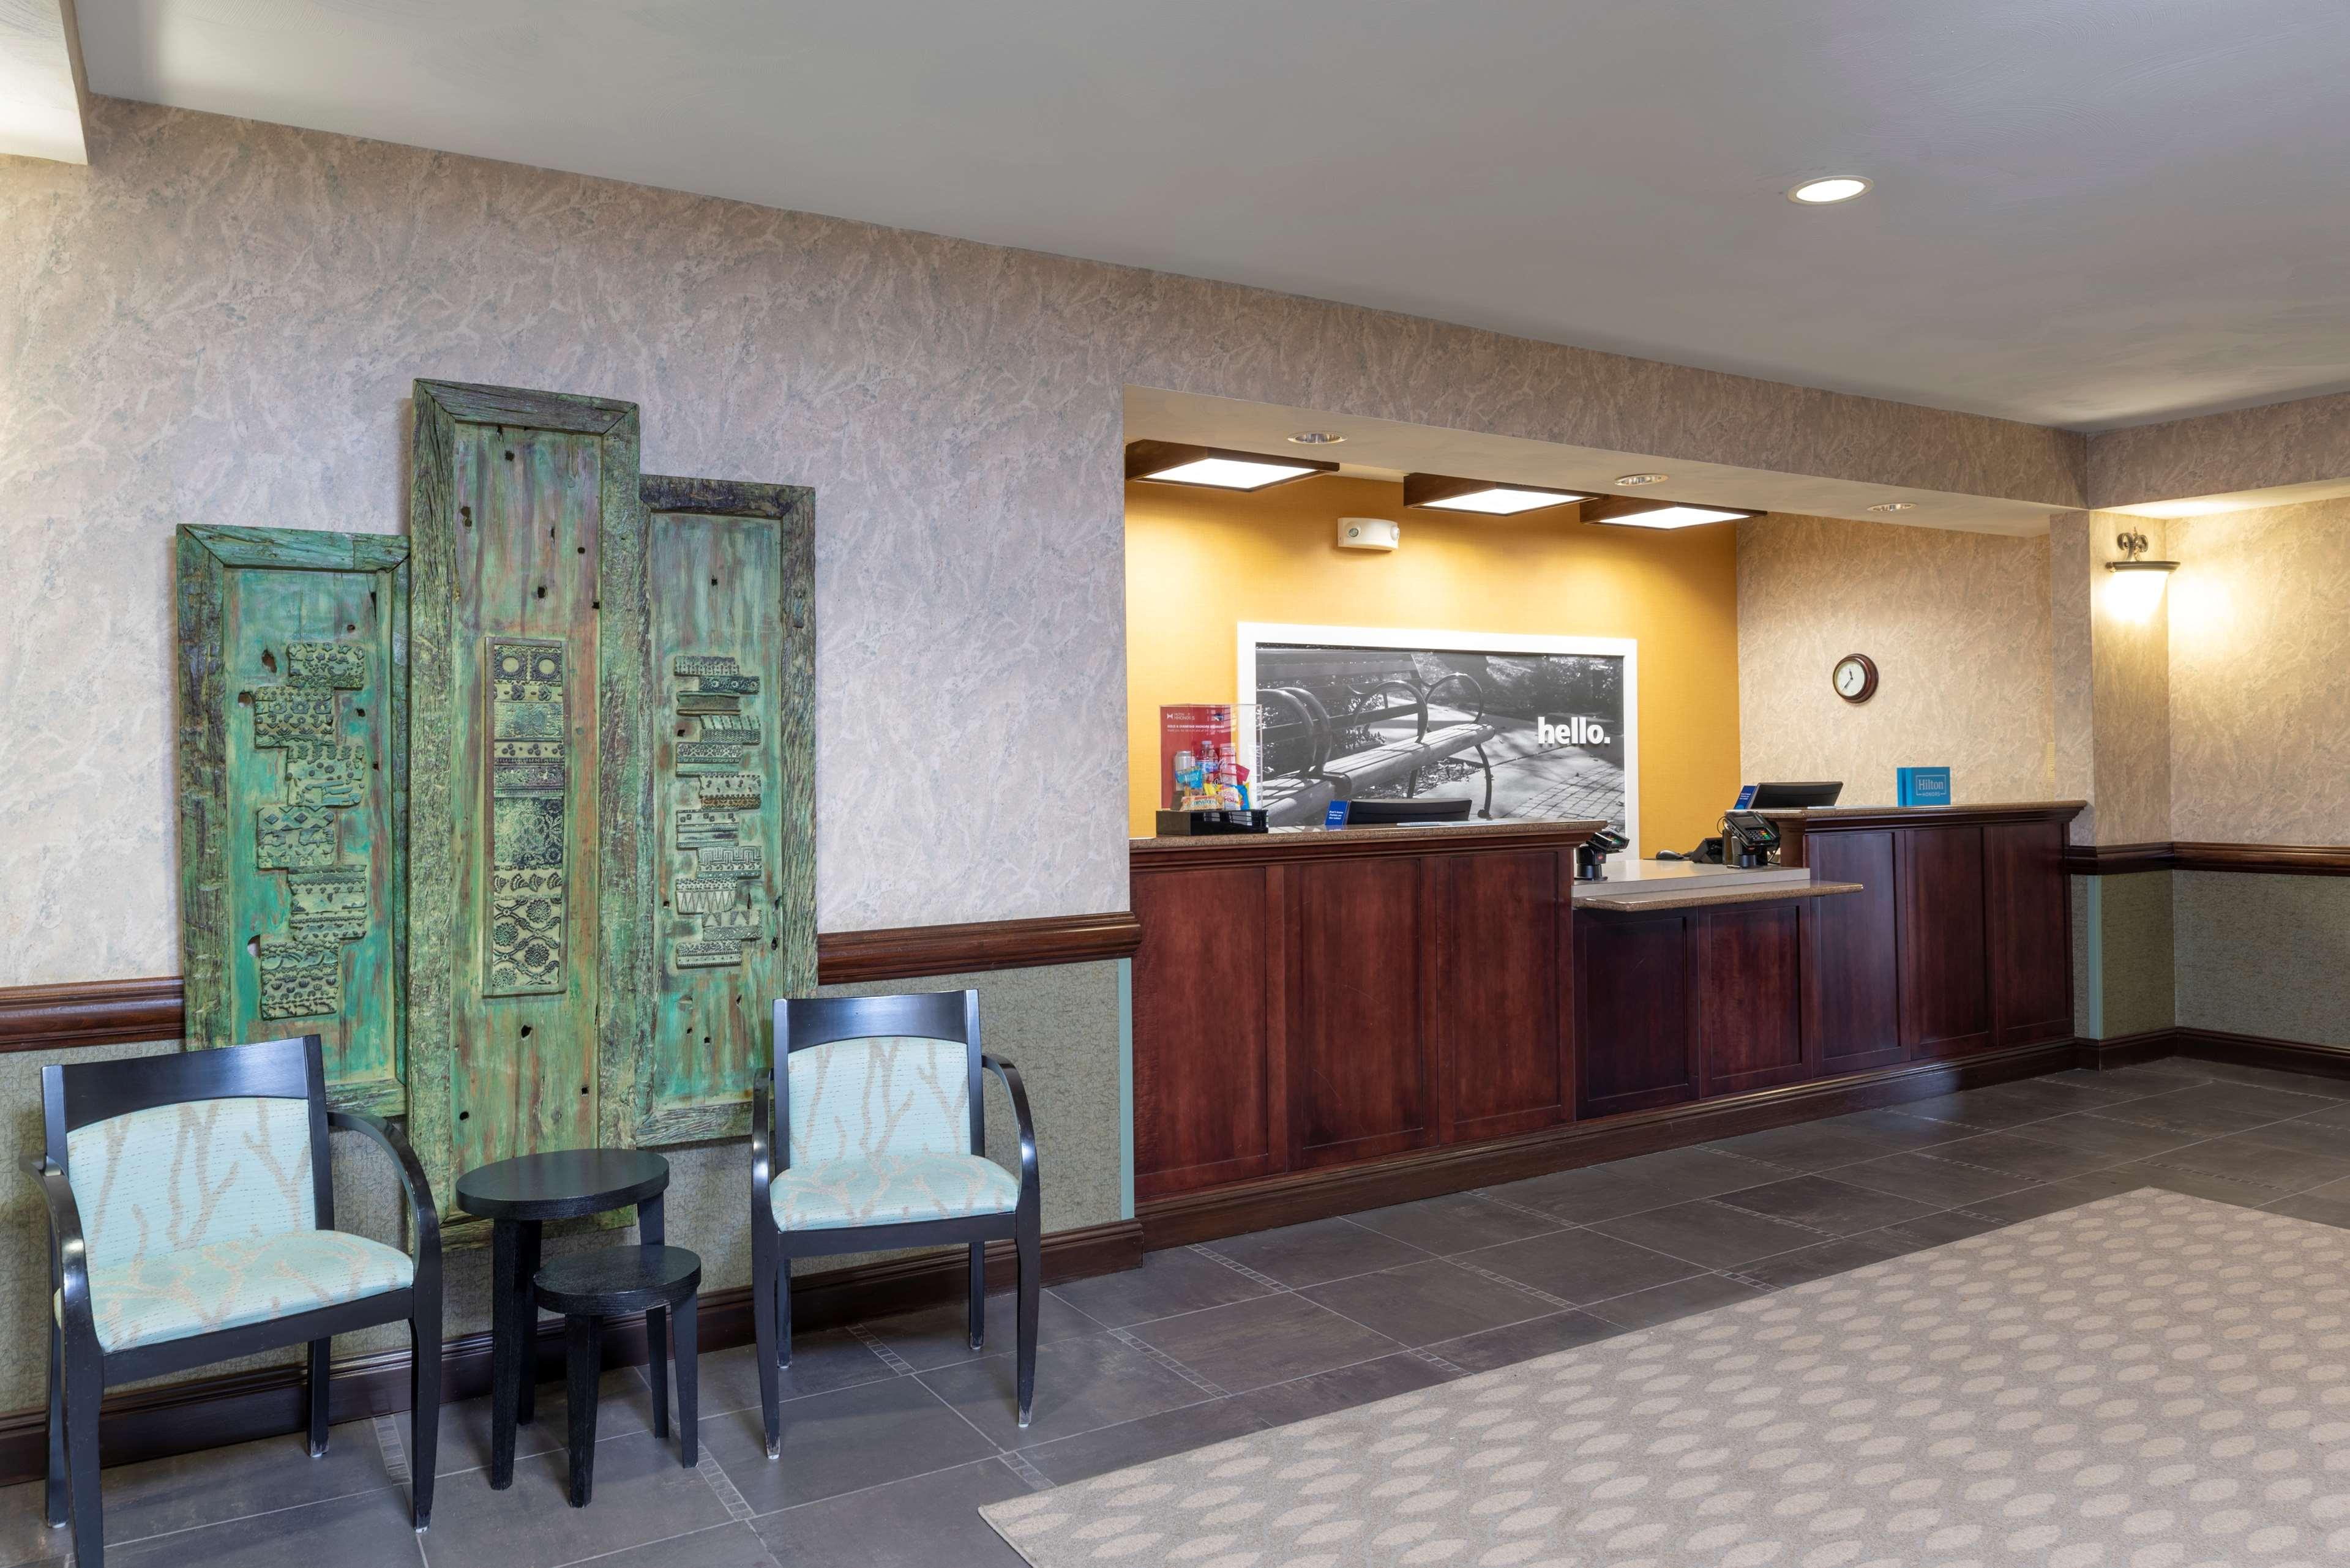 hampton inn suites valparaiso valparaiso indiana in. Black Bedroom Furniture Sets. Home Design Ideas